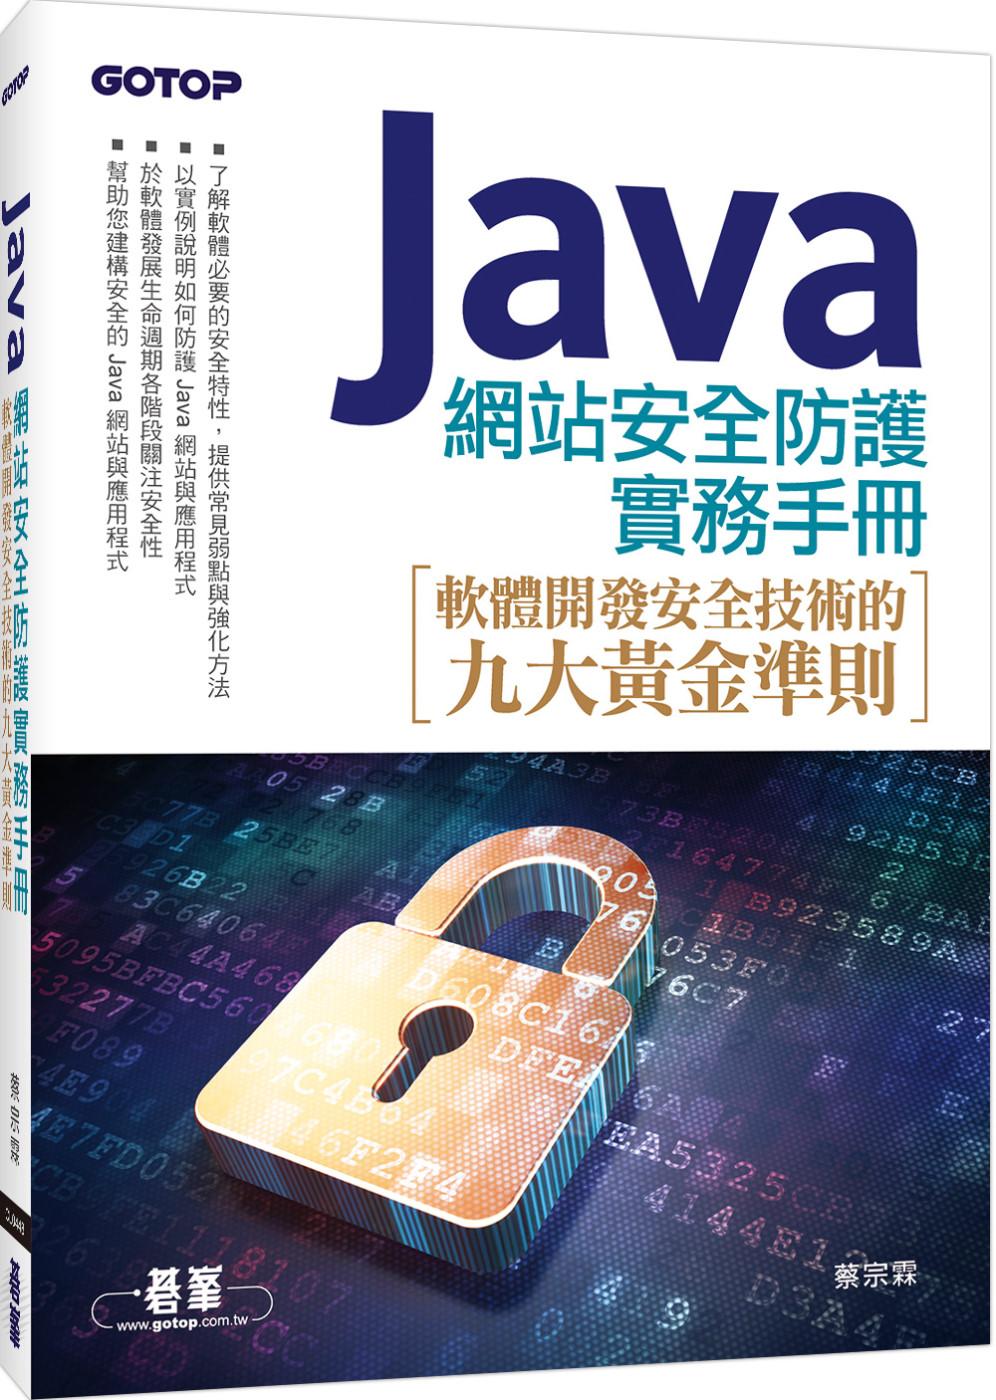 Java 網站安全防護實務手冊:軟體開發安全技術的九大黃金準則